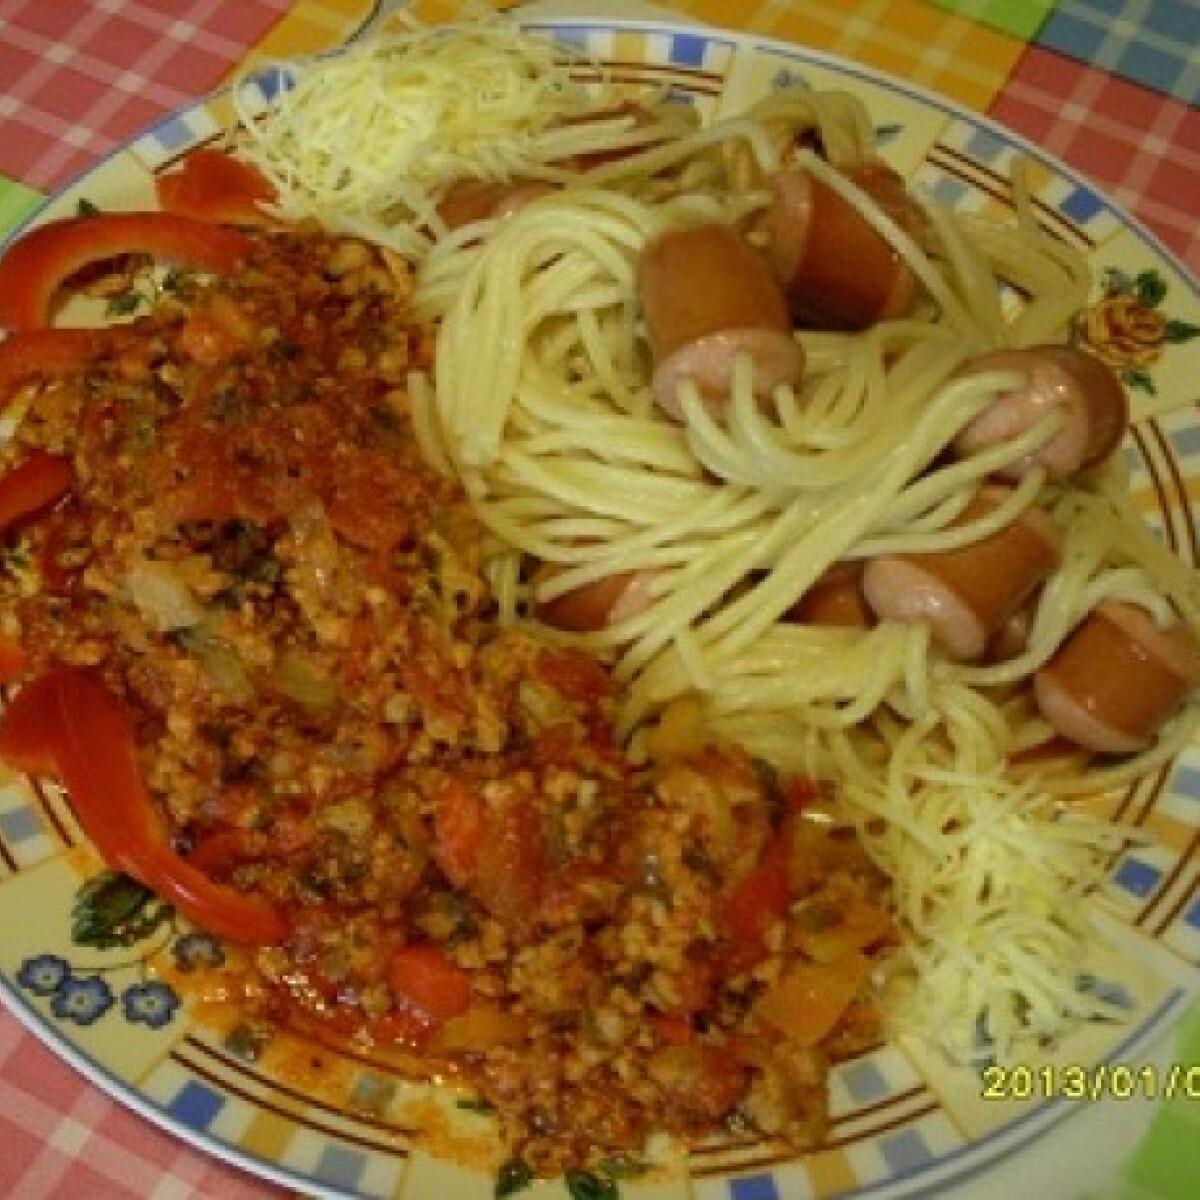 Spagettivel tűzdelt virsli olaszos raguval